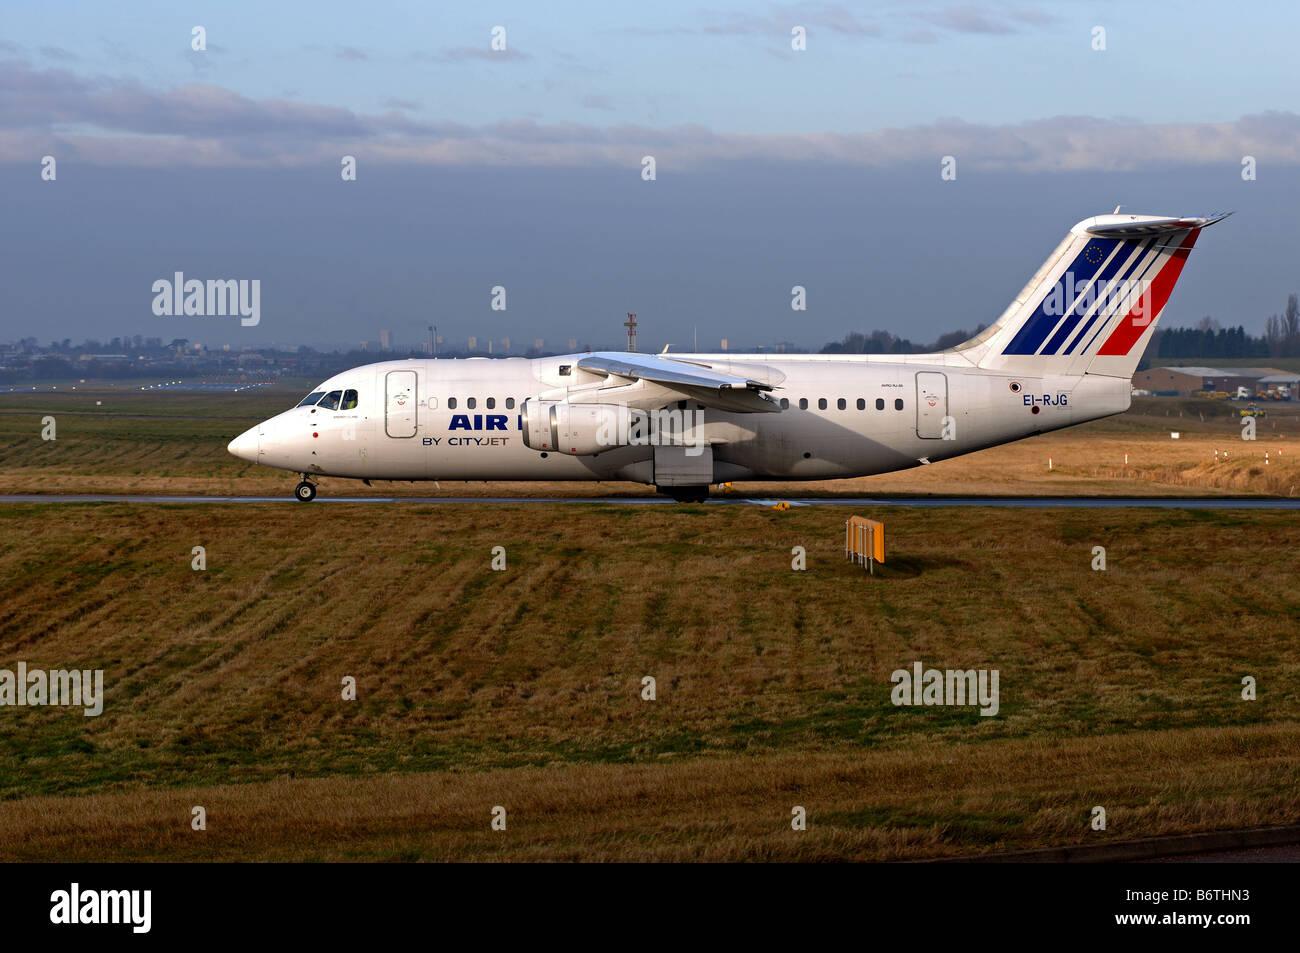 Air France Cityjet Avro RJ85 aircraft at Birmingham International Airport UK - Stock Image